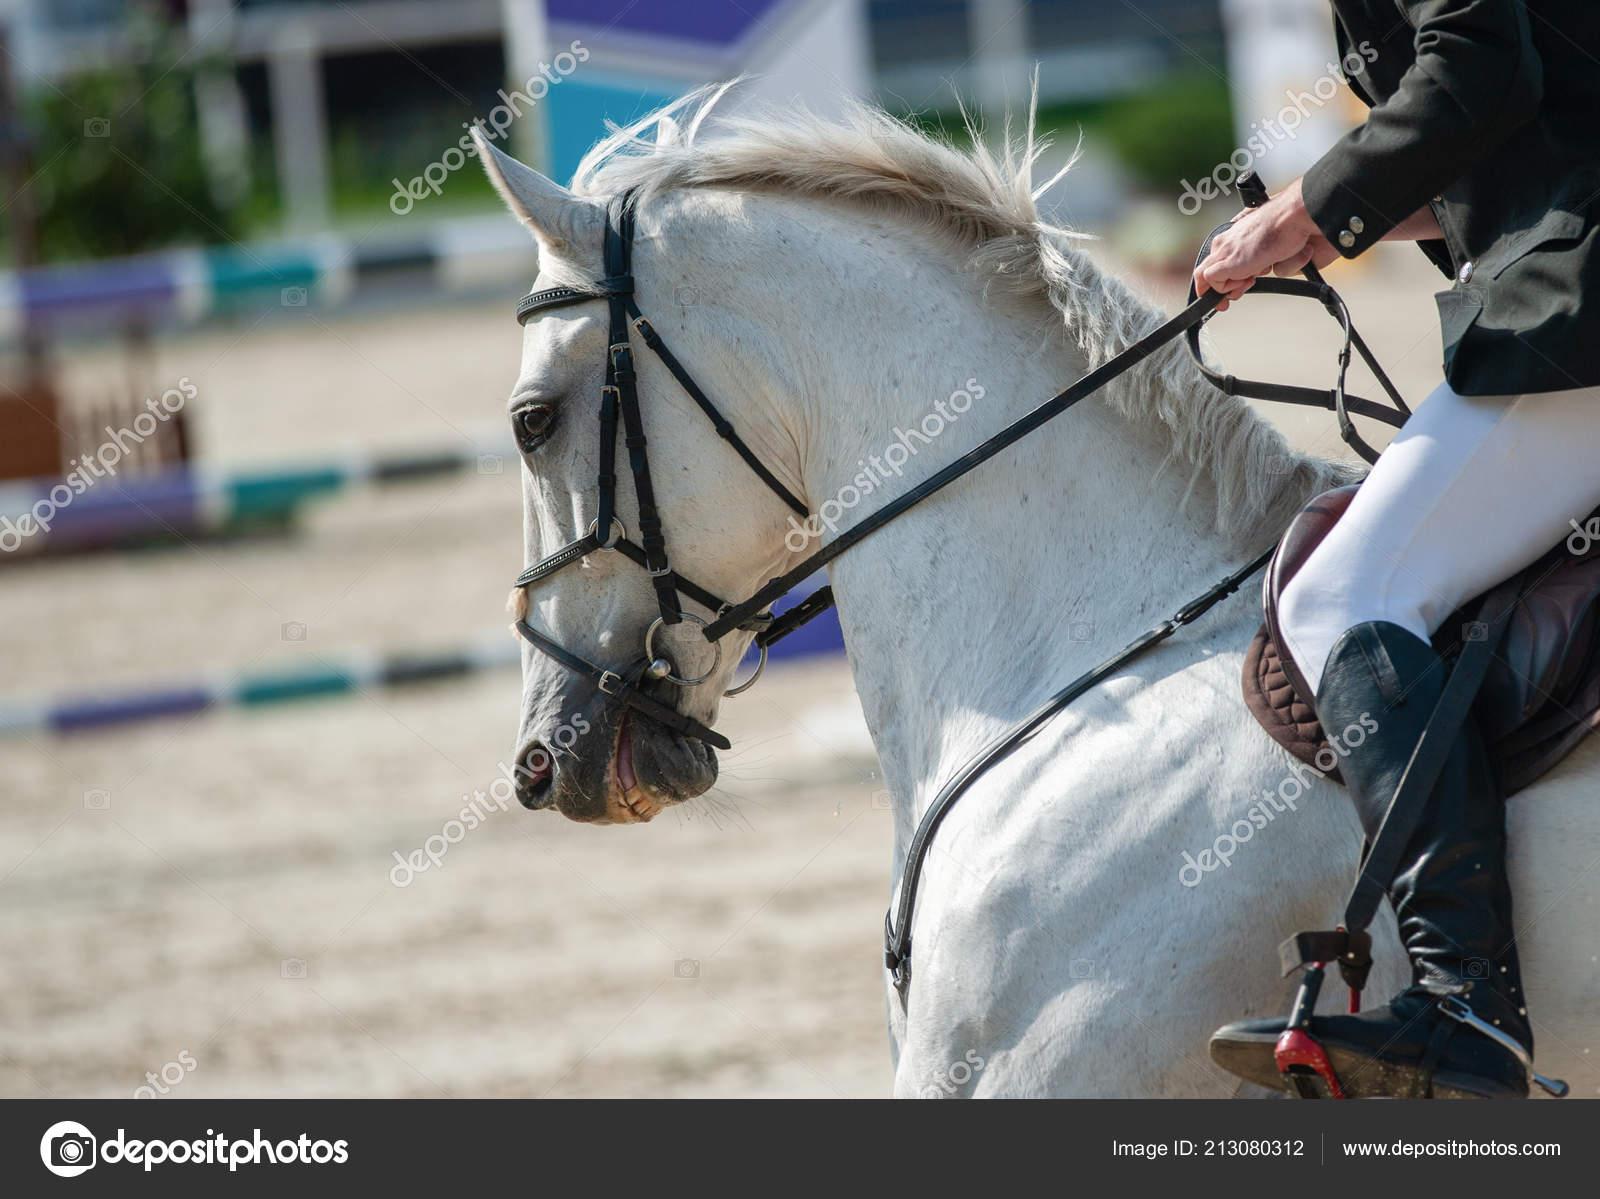 White Horse Show Jumping Rider White Horse Show Jumping Championship Stock Photo C Mari Art 213080312